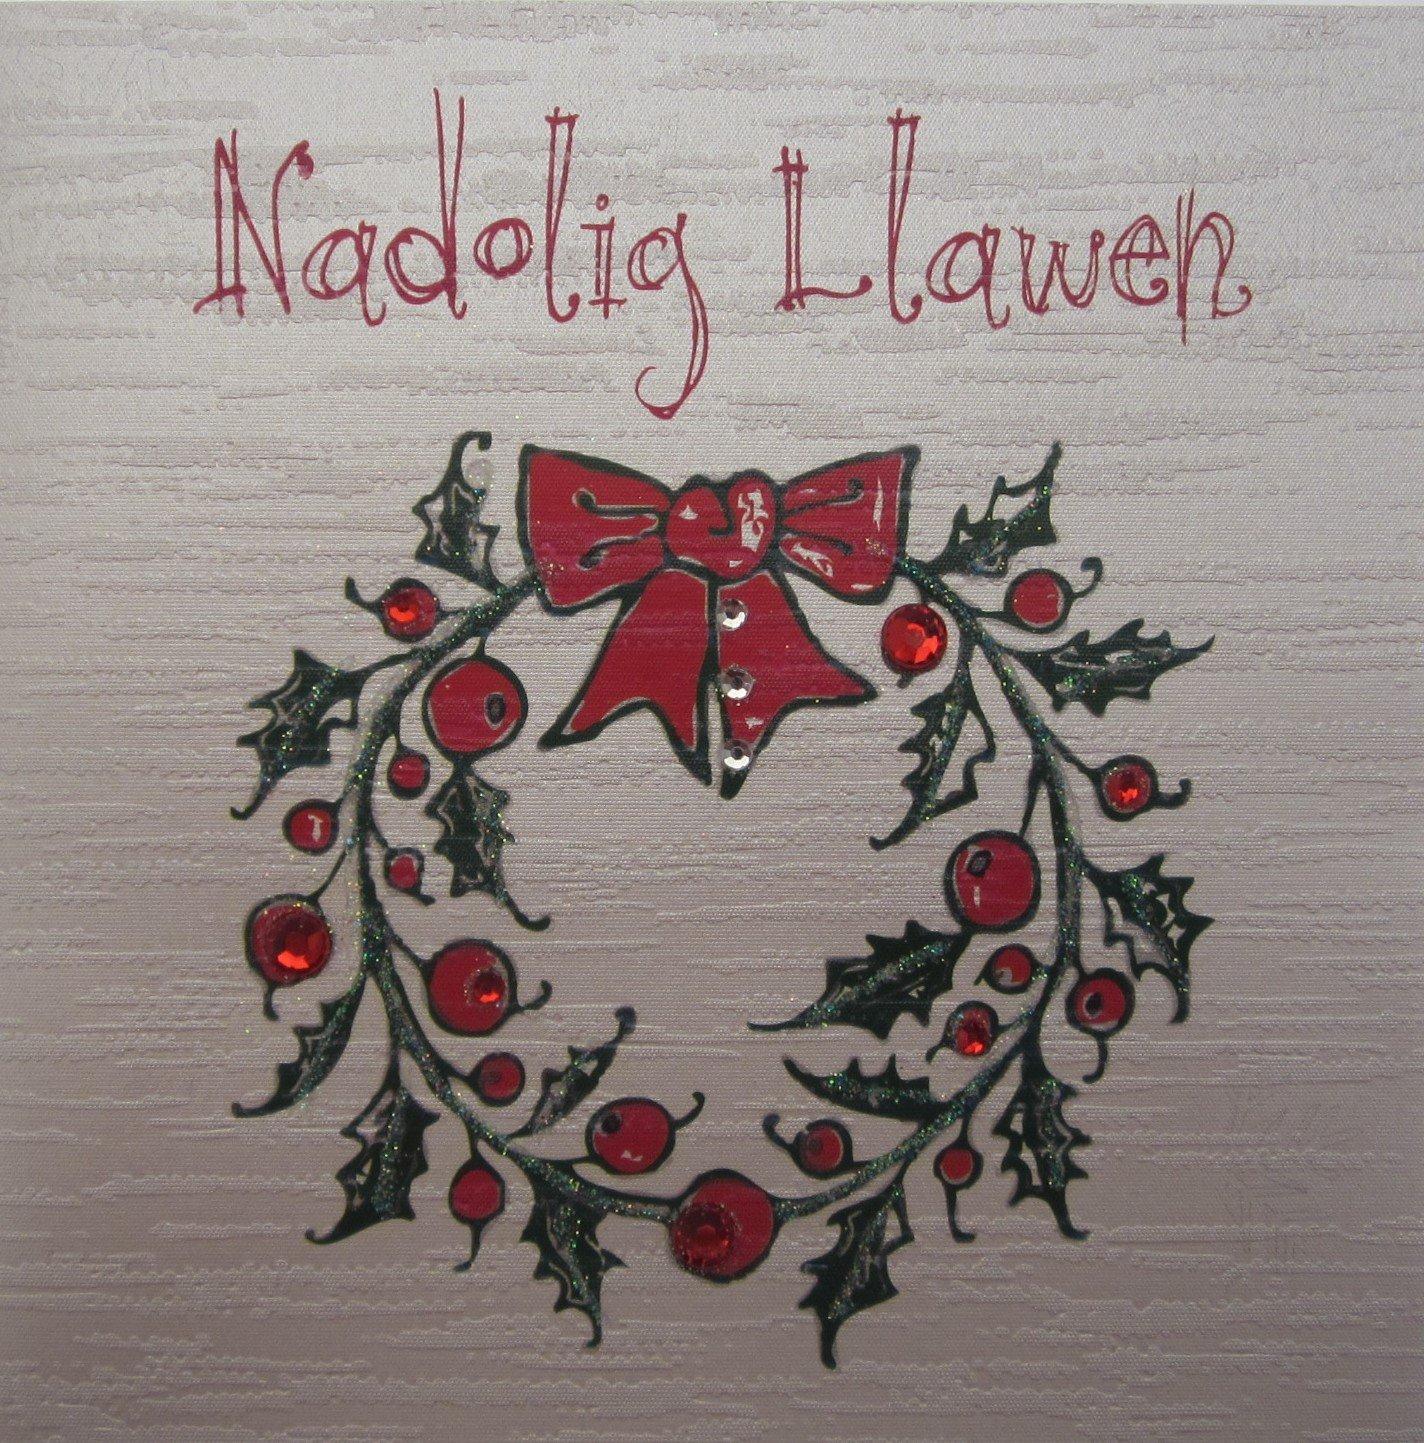 Nadolig llawen handmade welsh christmas card wreath amazon nadolig llawen handmade welsh christmas card wreath amazon kitchen home kristyandbryce Image collections